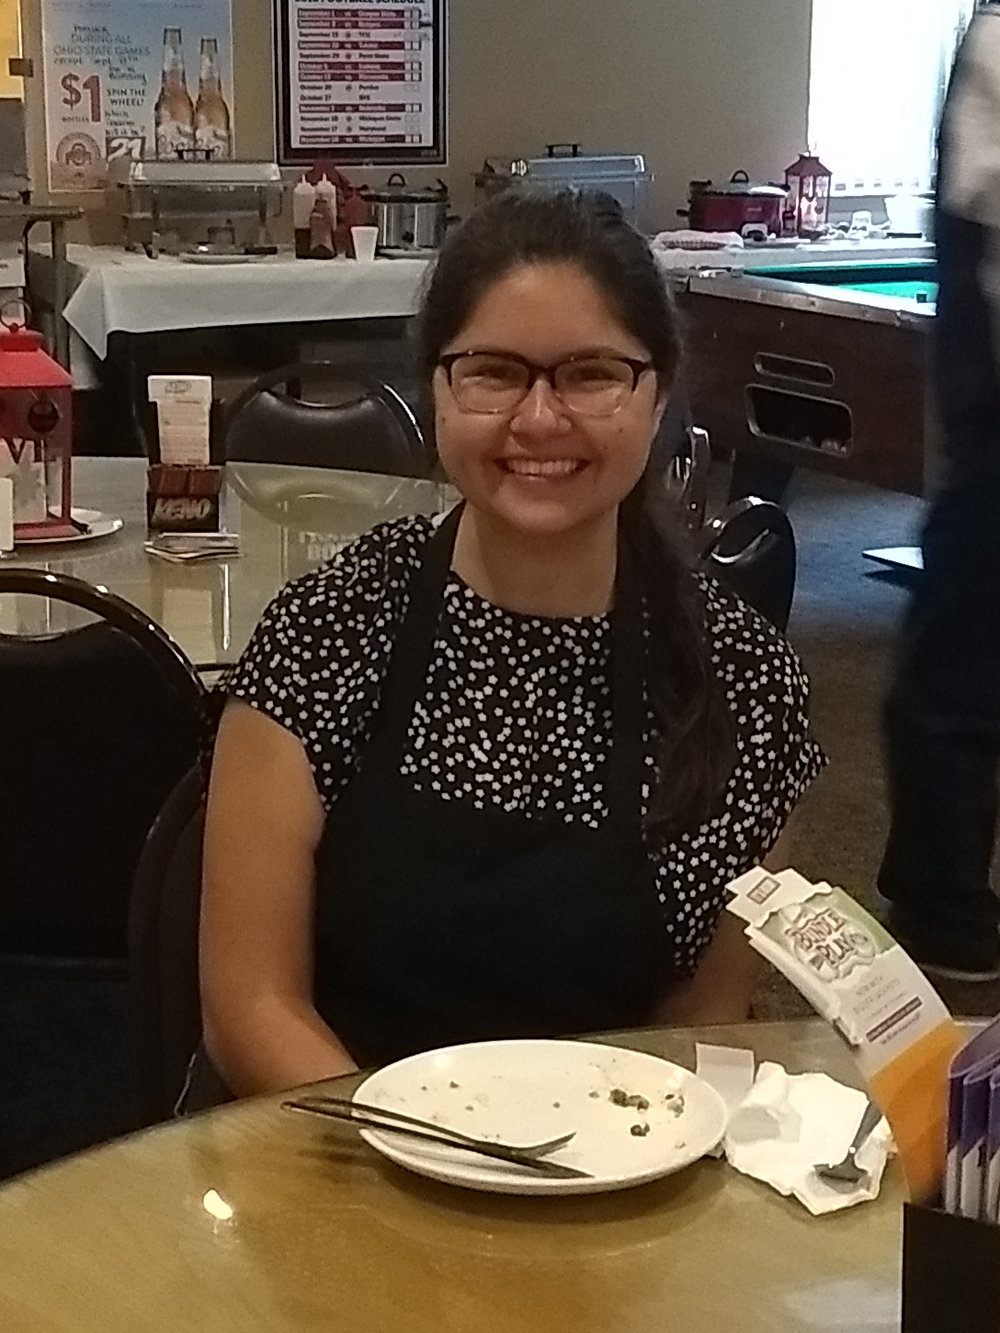 Scholarship recipient, Luisa Parrish enjoyed the brunch!